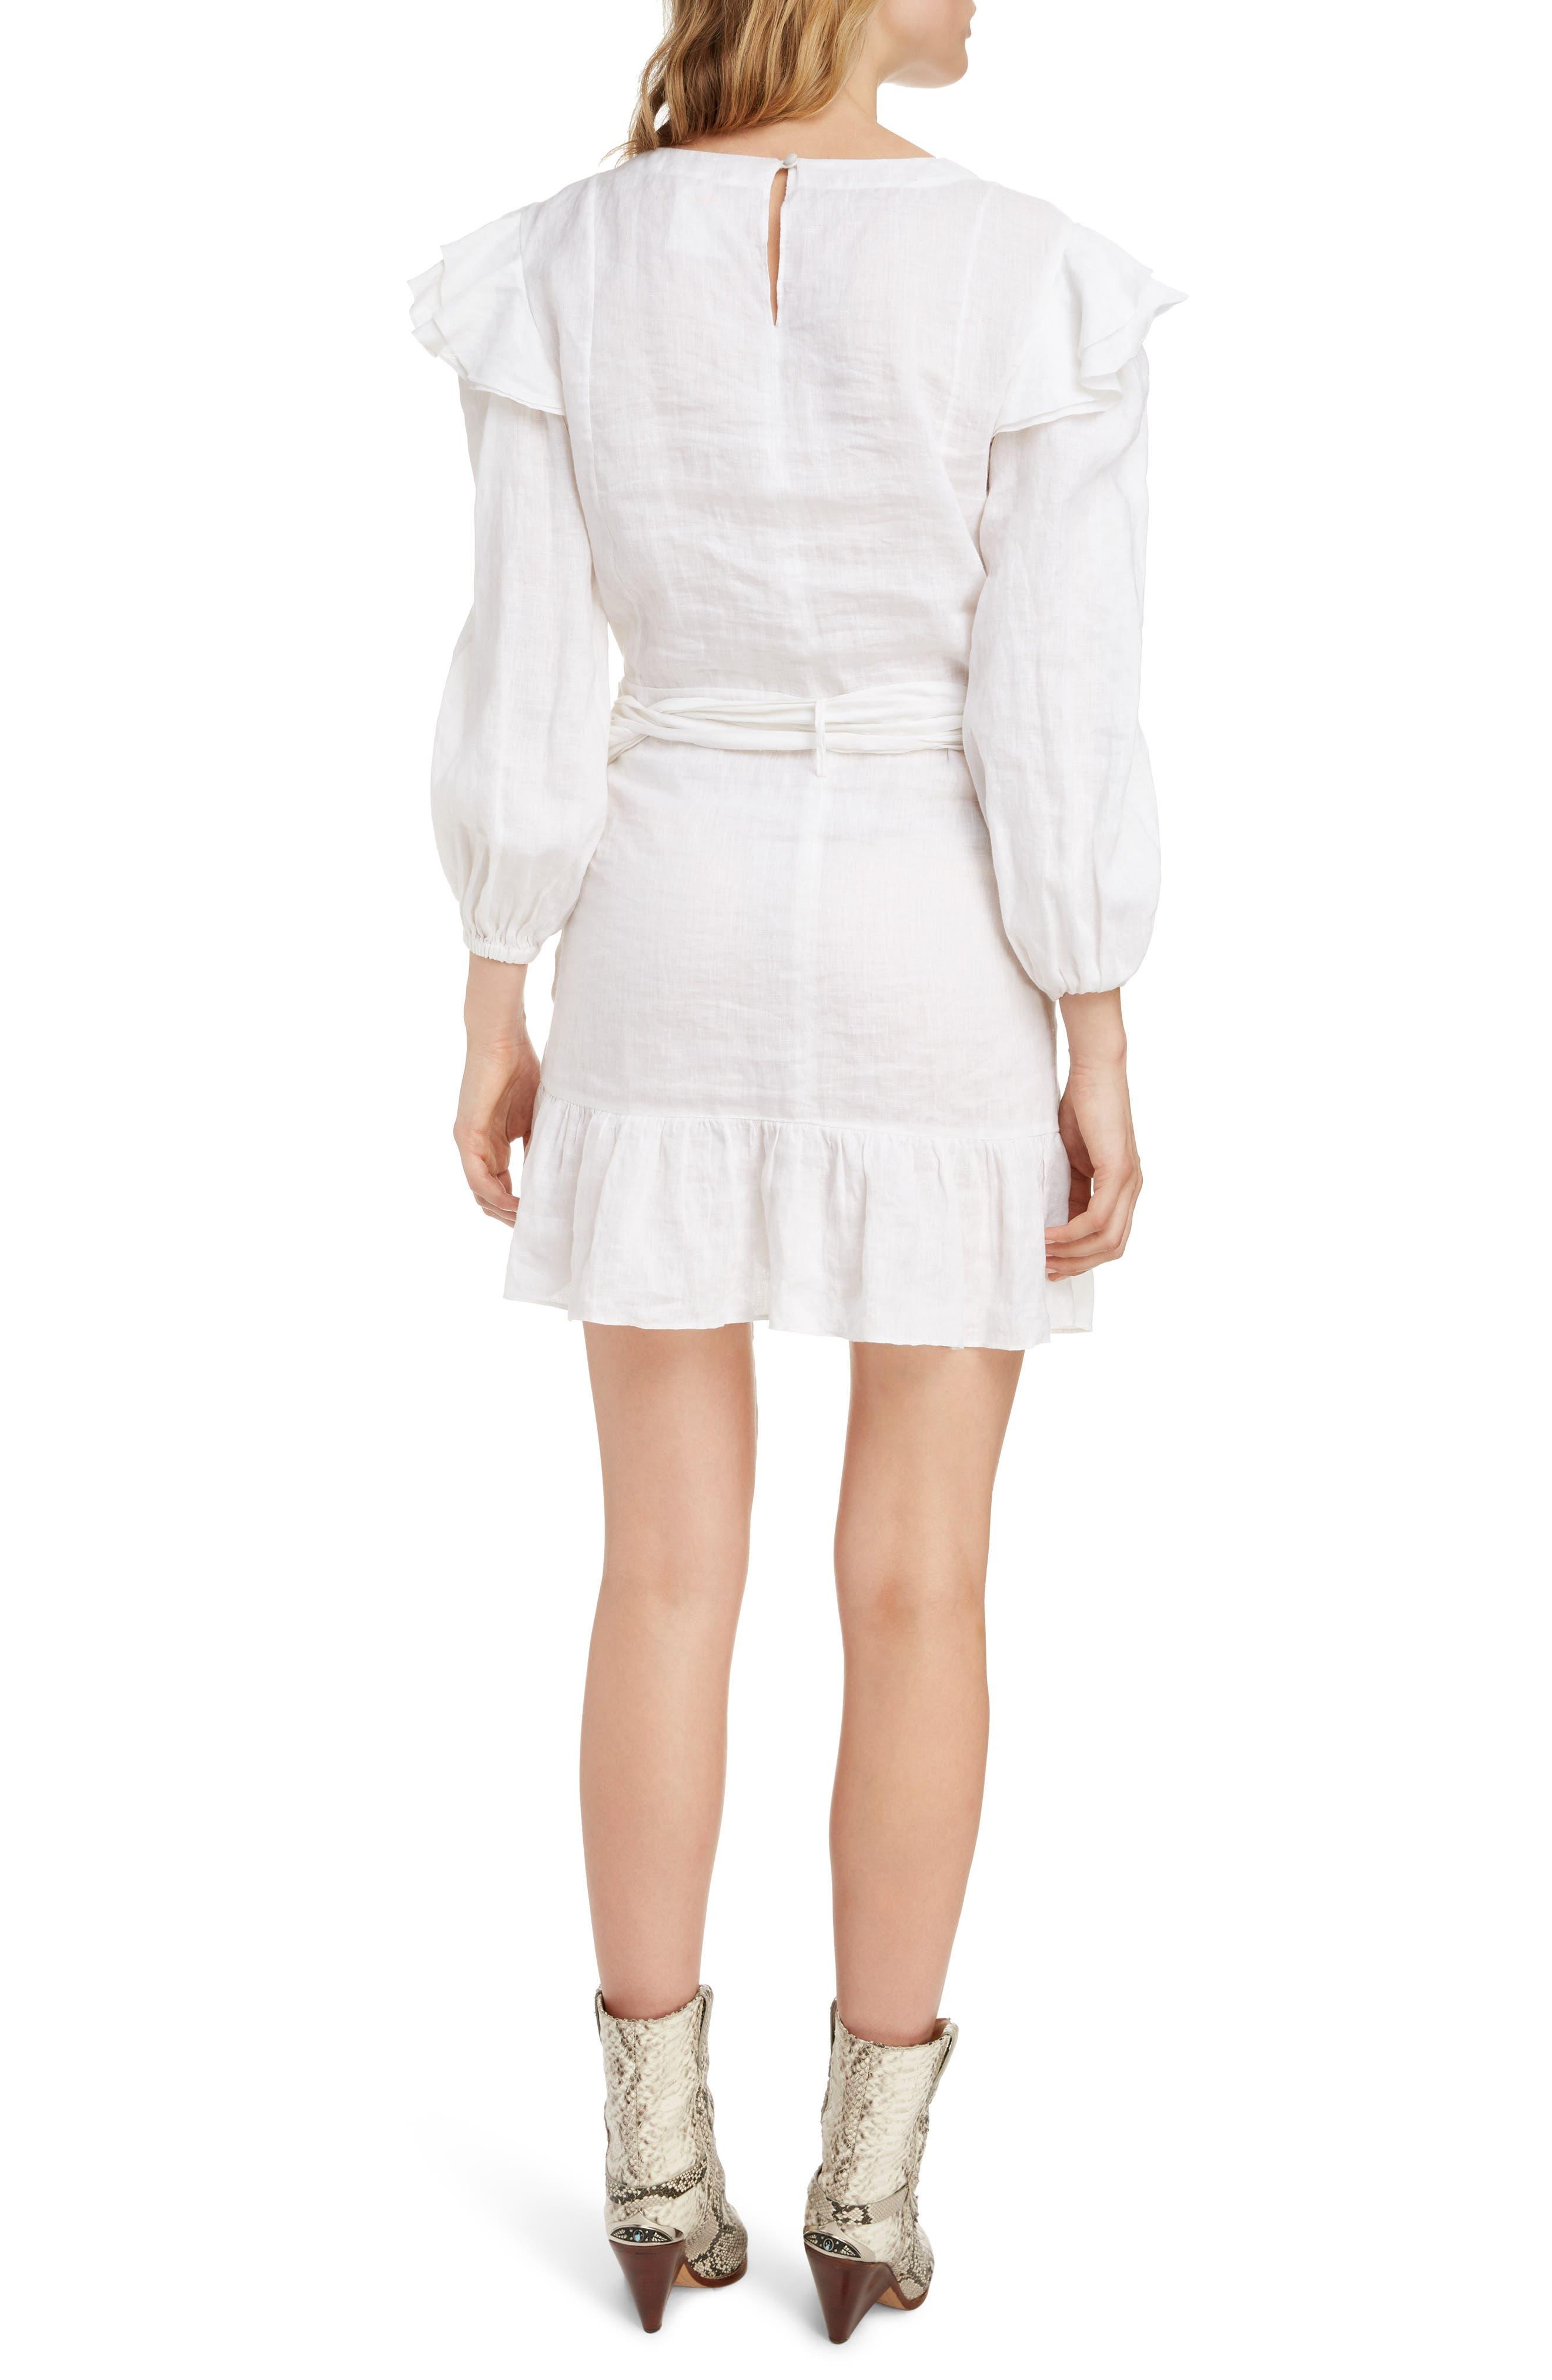 059fa85df37 Women s Isabel Marant Étoile Designer Dresses